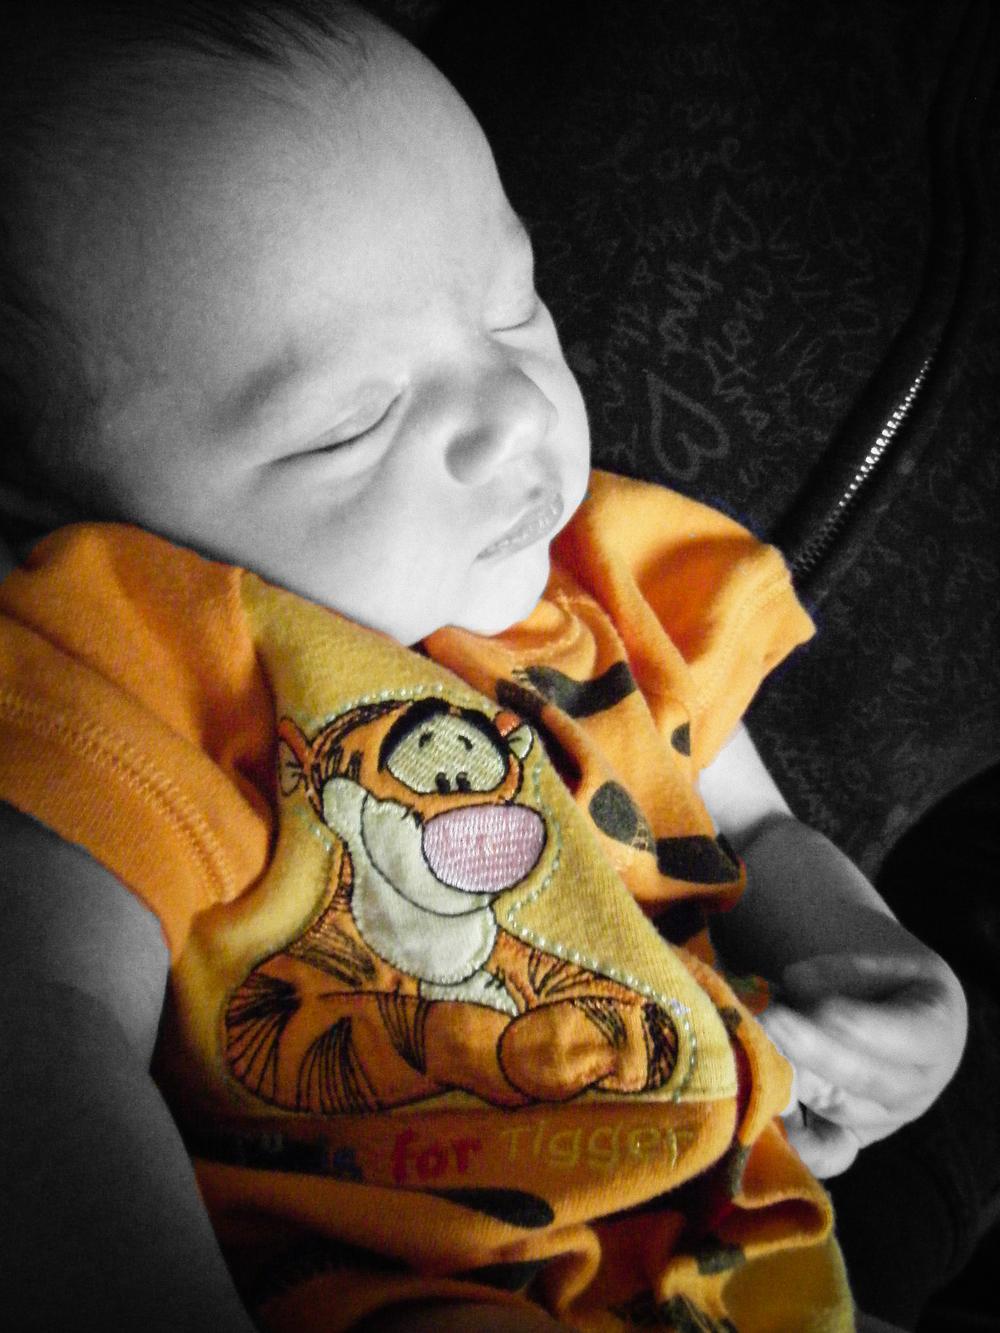 baby-wearing-an-orange-tigger-onesie.jpg